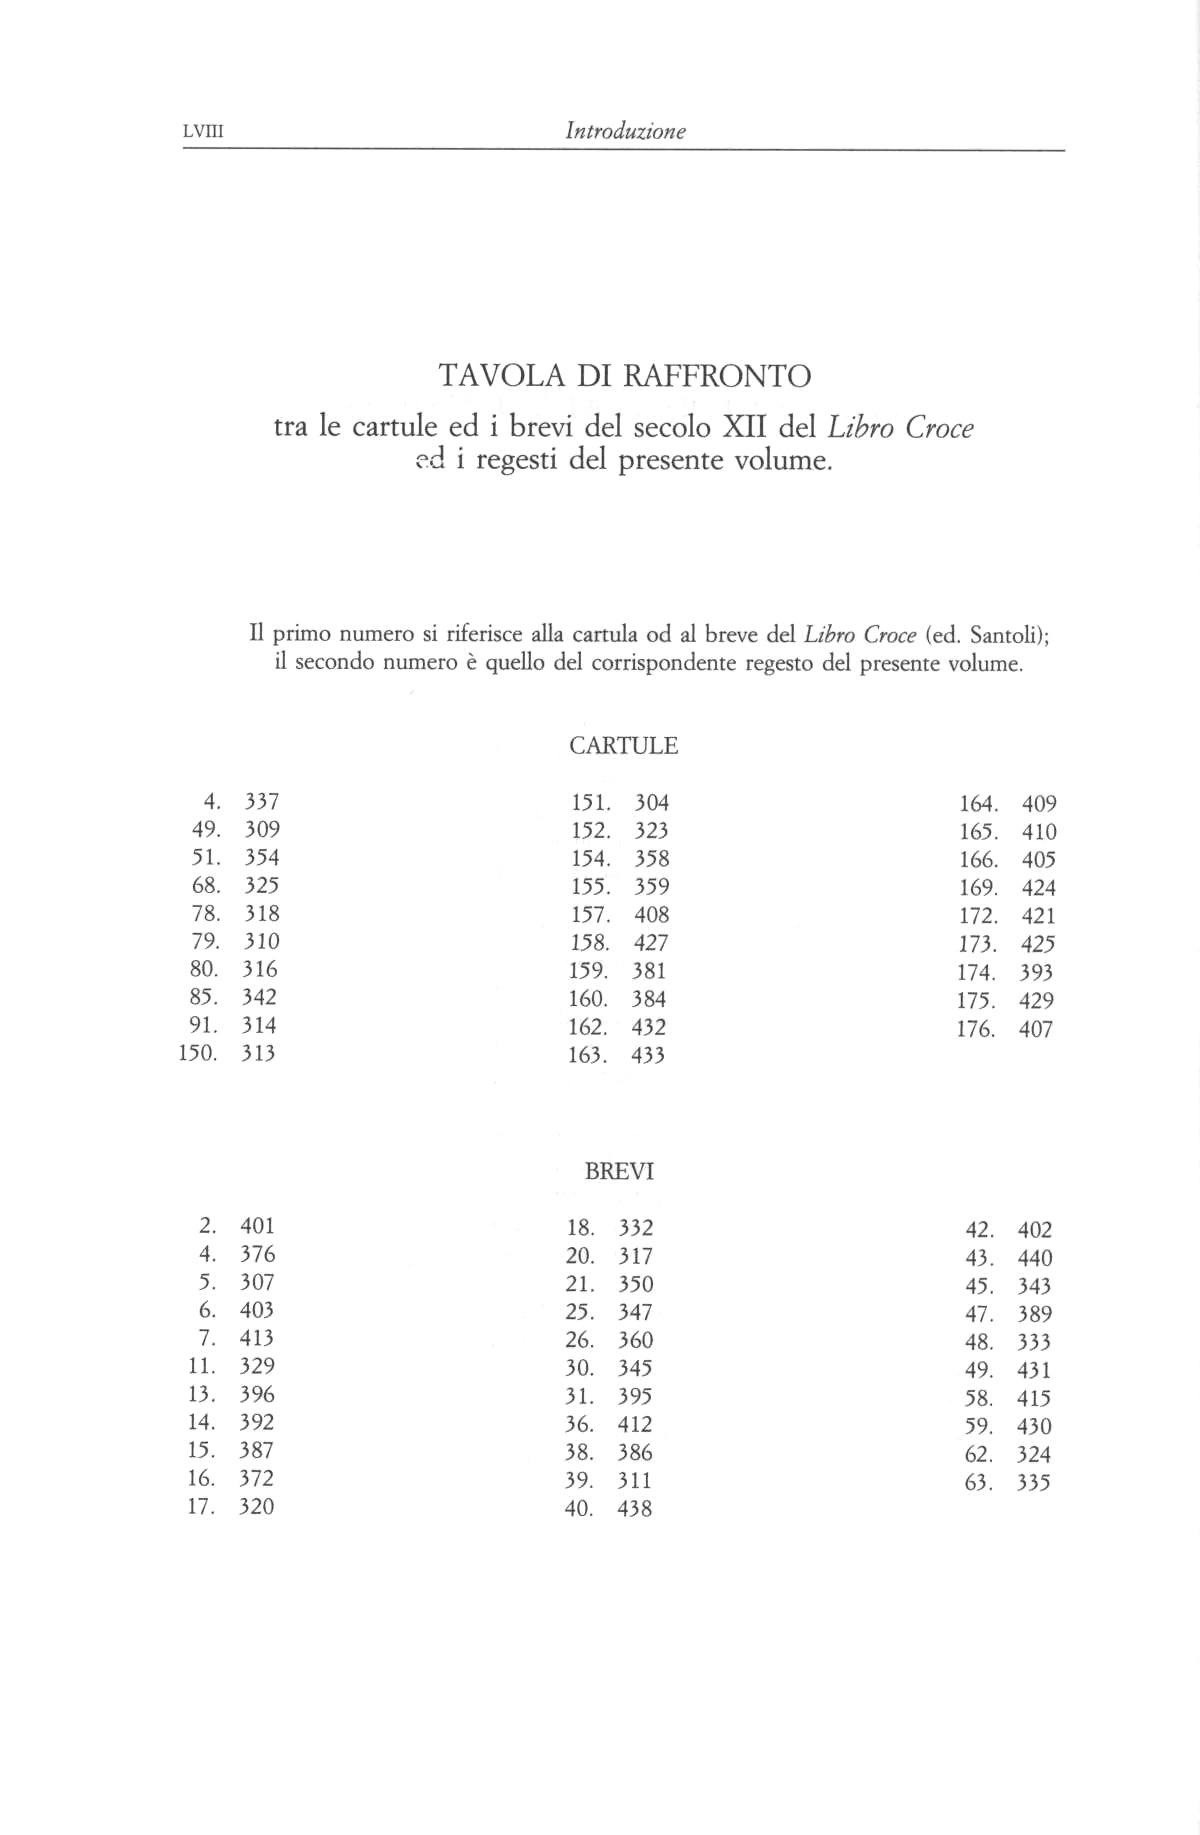 !Canonica S. Zenone XII 00058.jpg